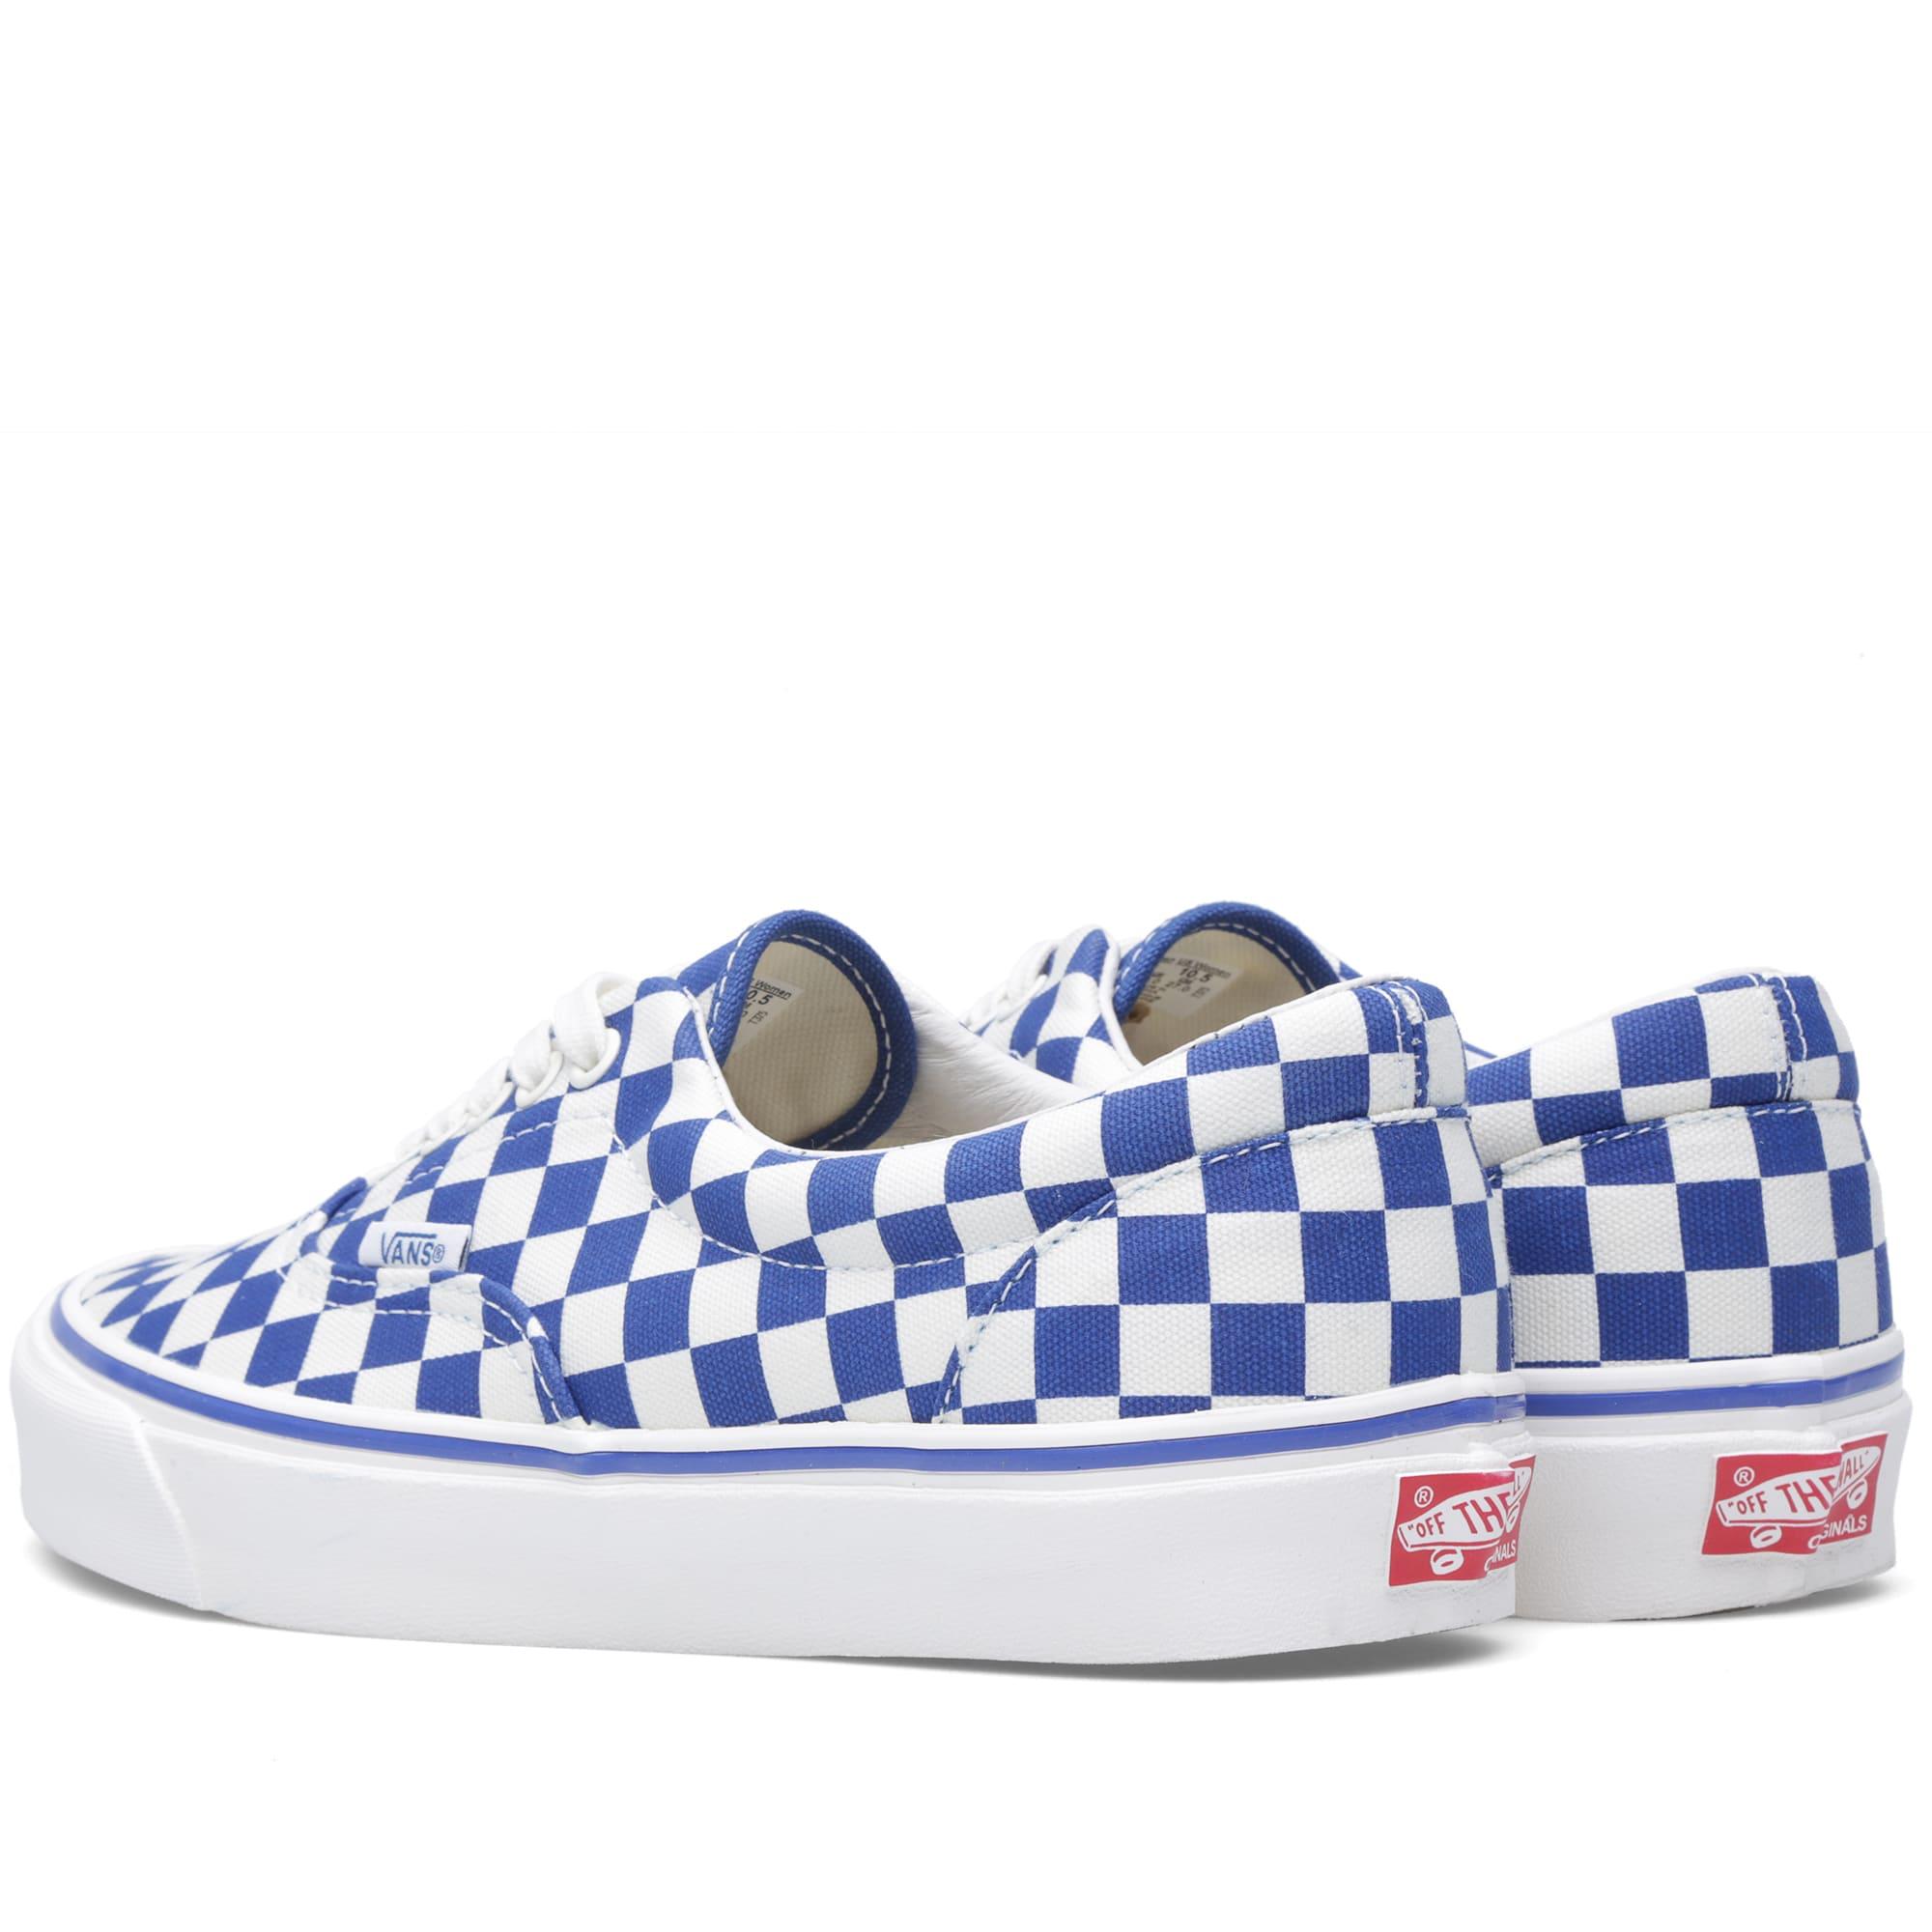 b32f08475a Vans Vault OG Era LX True Blue Checkerboard